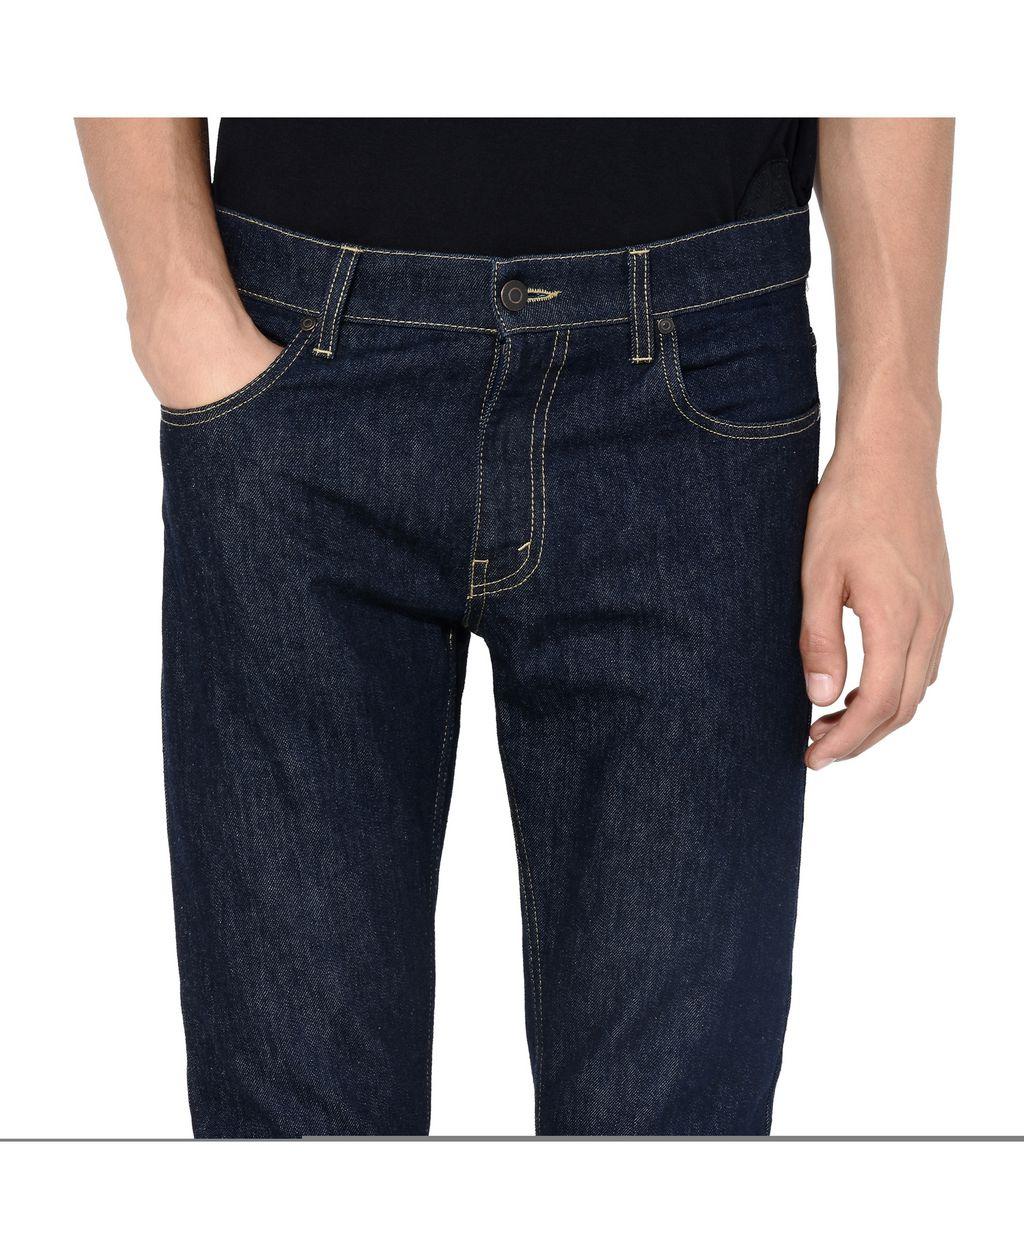 Raw Denim Straight Leg Jeans - STELLA McCARTNEY MEN